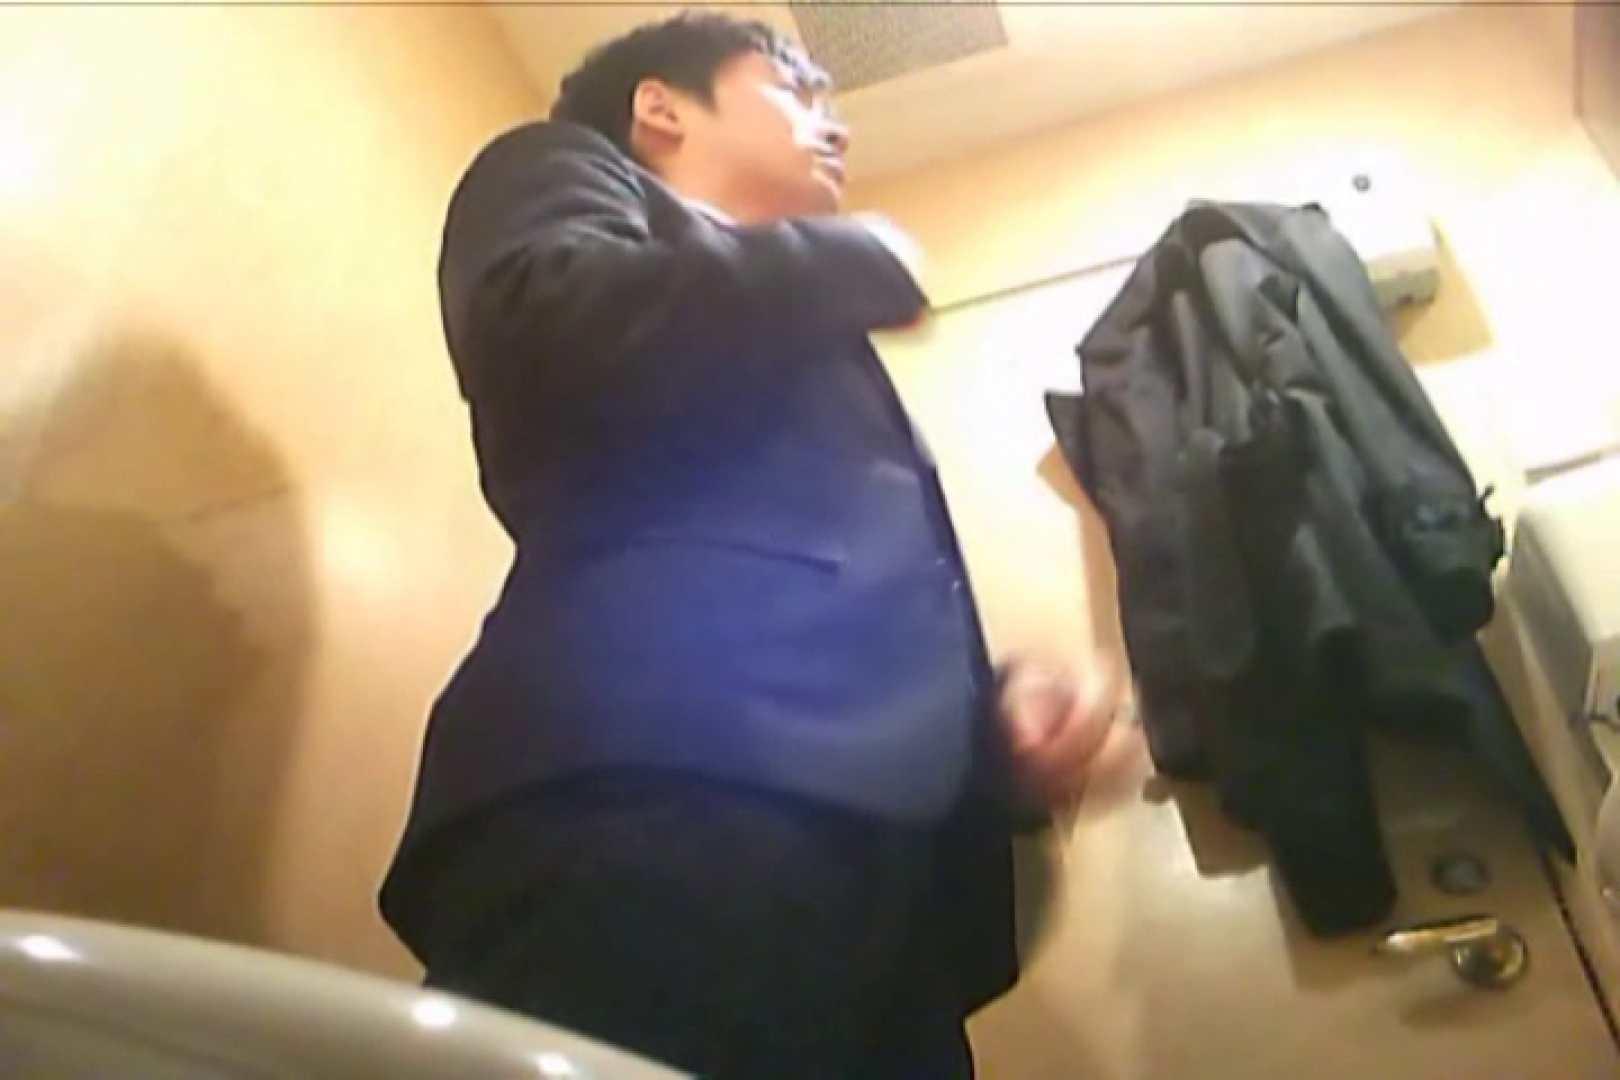 SEASON 2ND!掴み取りさんの洗面所覗き!in新幹線!VOL.20 覗き特集 ゲイエロ画像 9画像 6